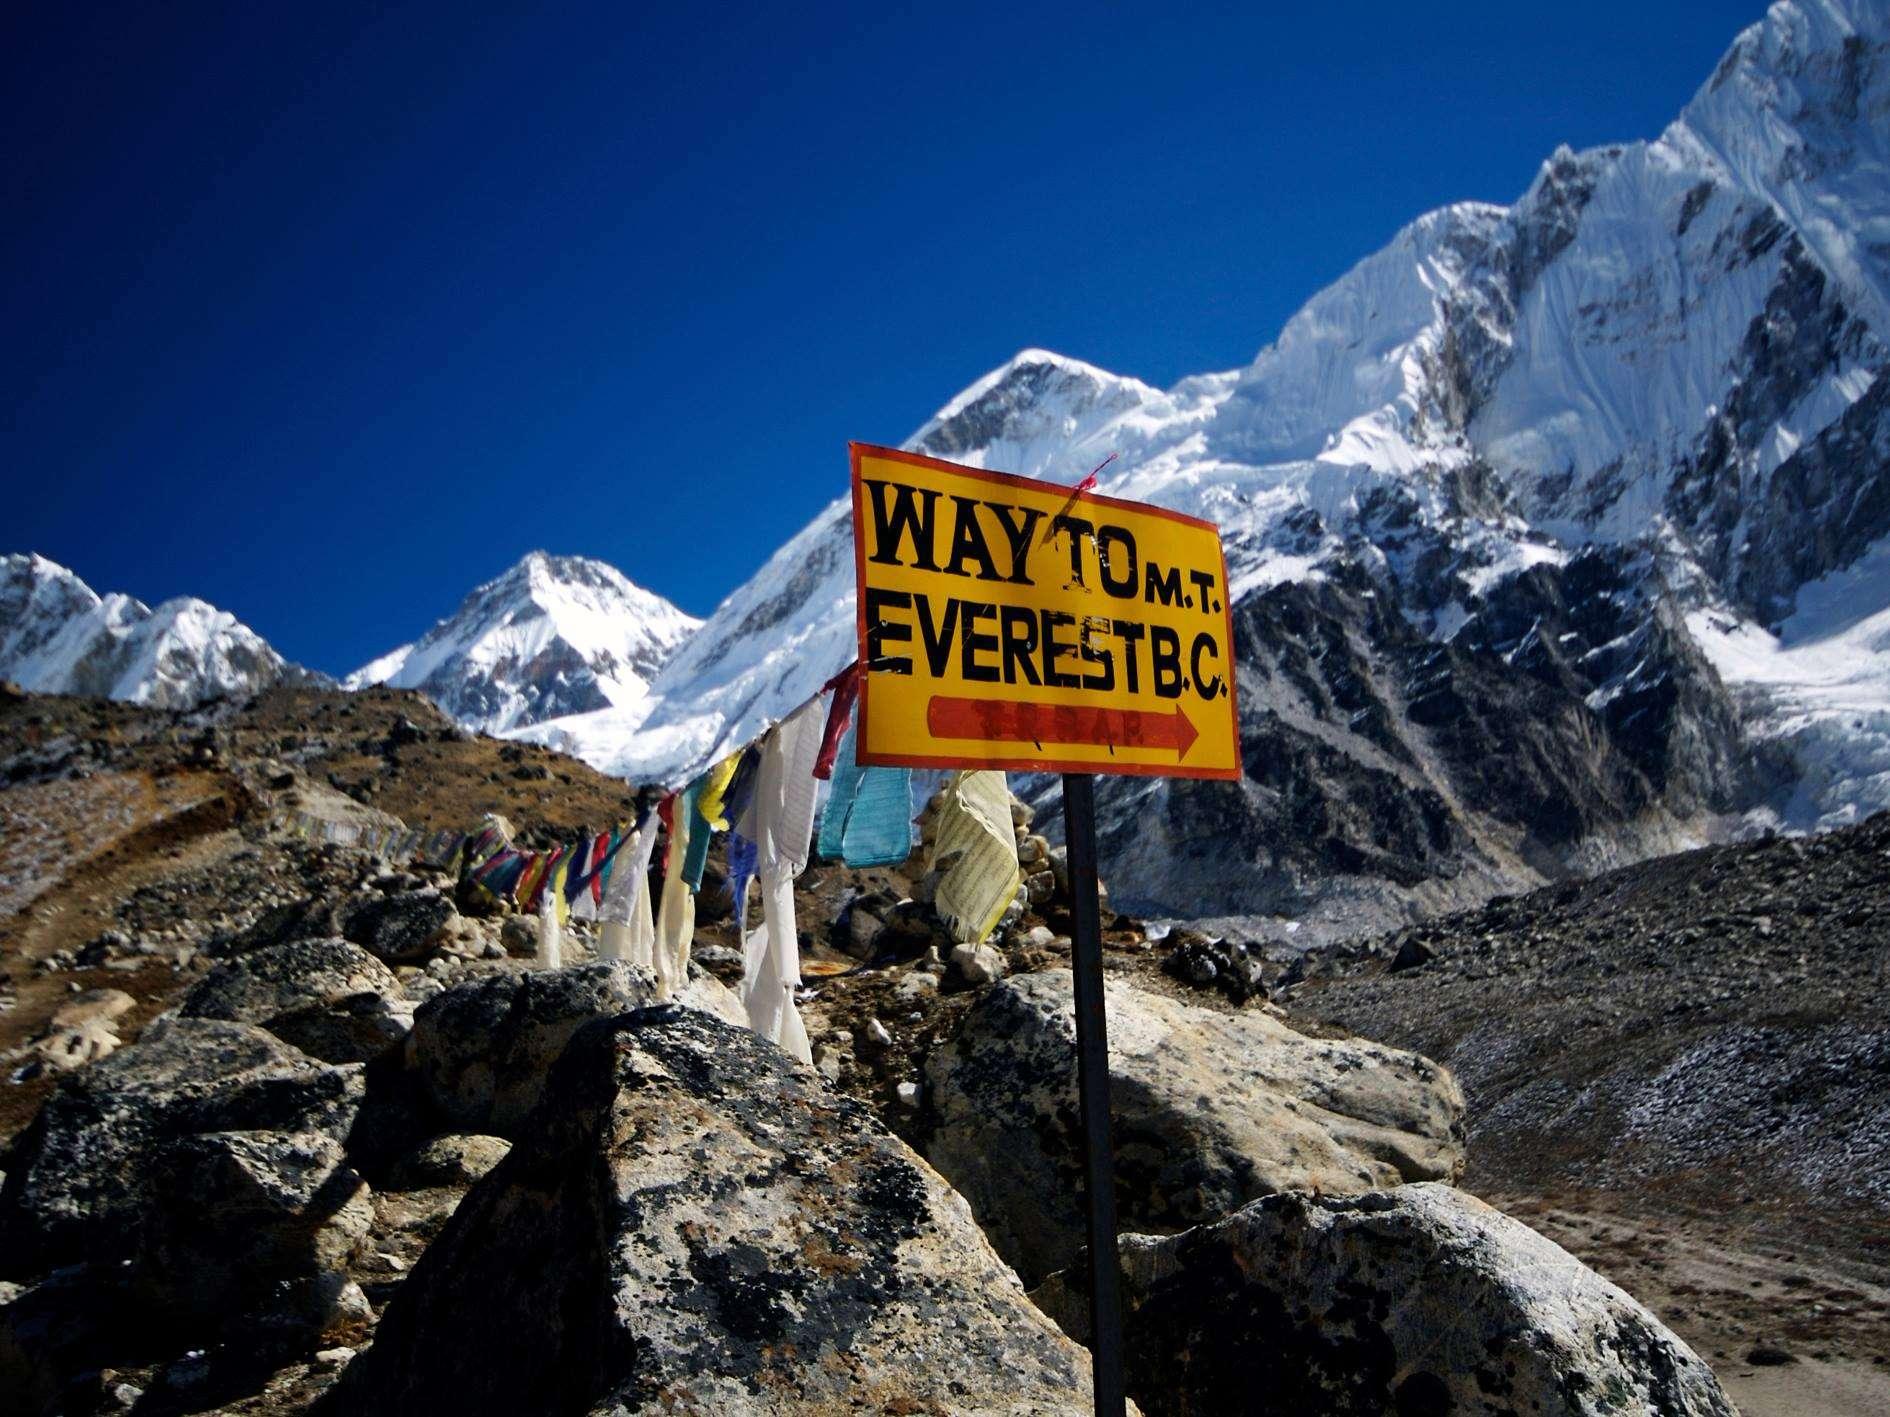 21-Day Everest Base Camp Trek & Jungle Safari - Nepal Itinerary